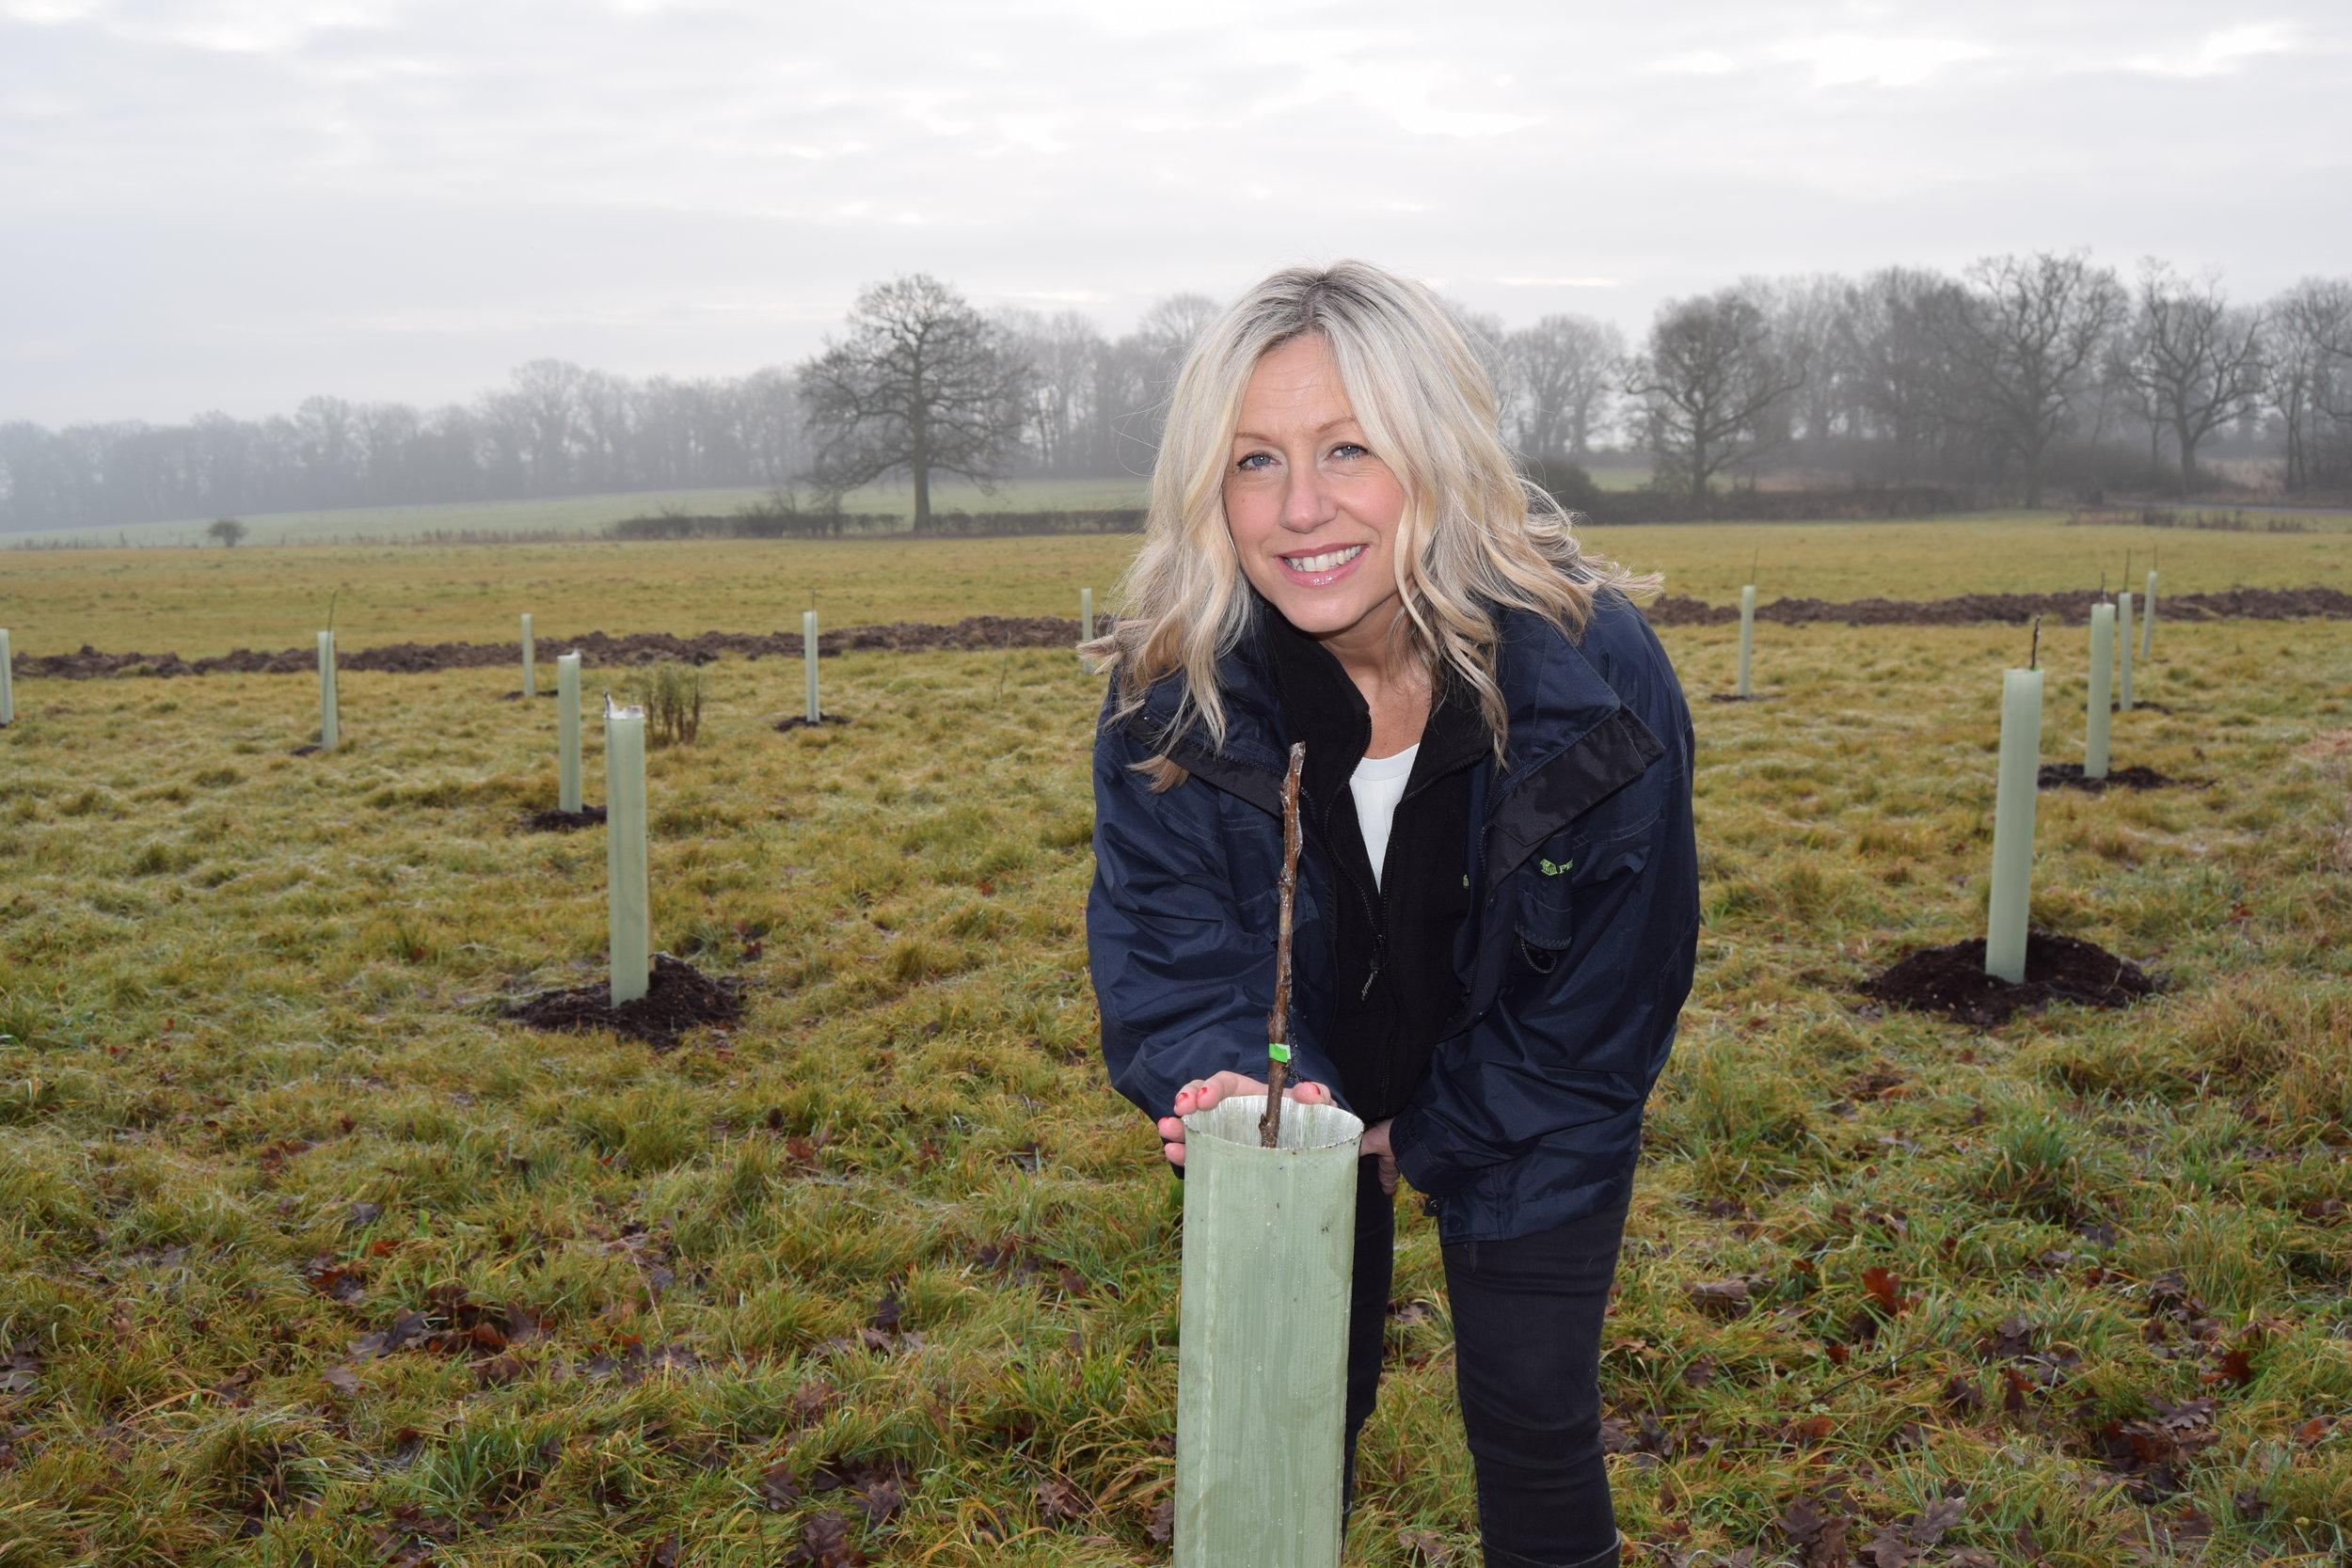 Tree planting in Stratford upon Avon